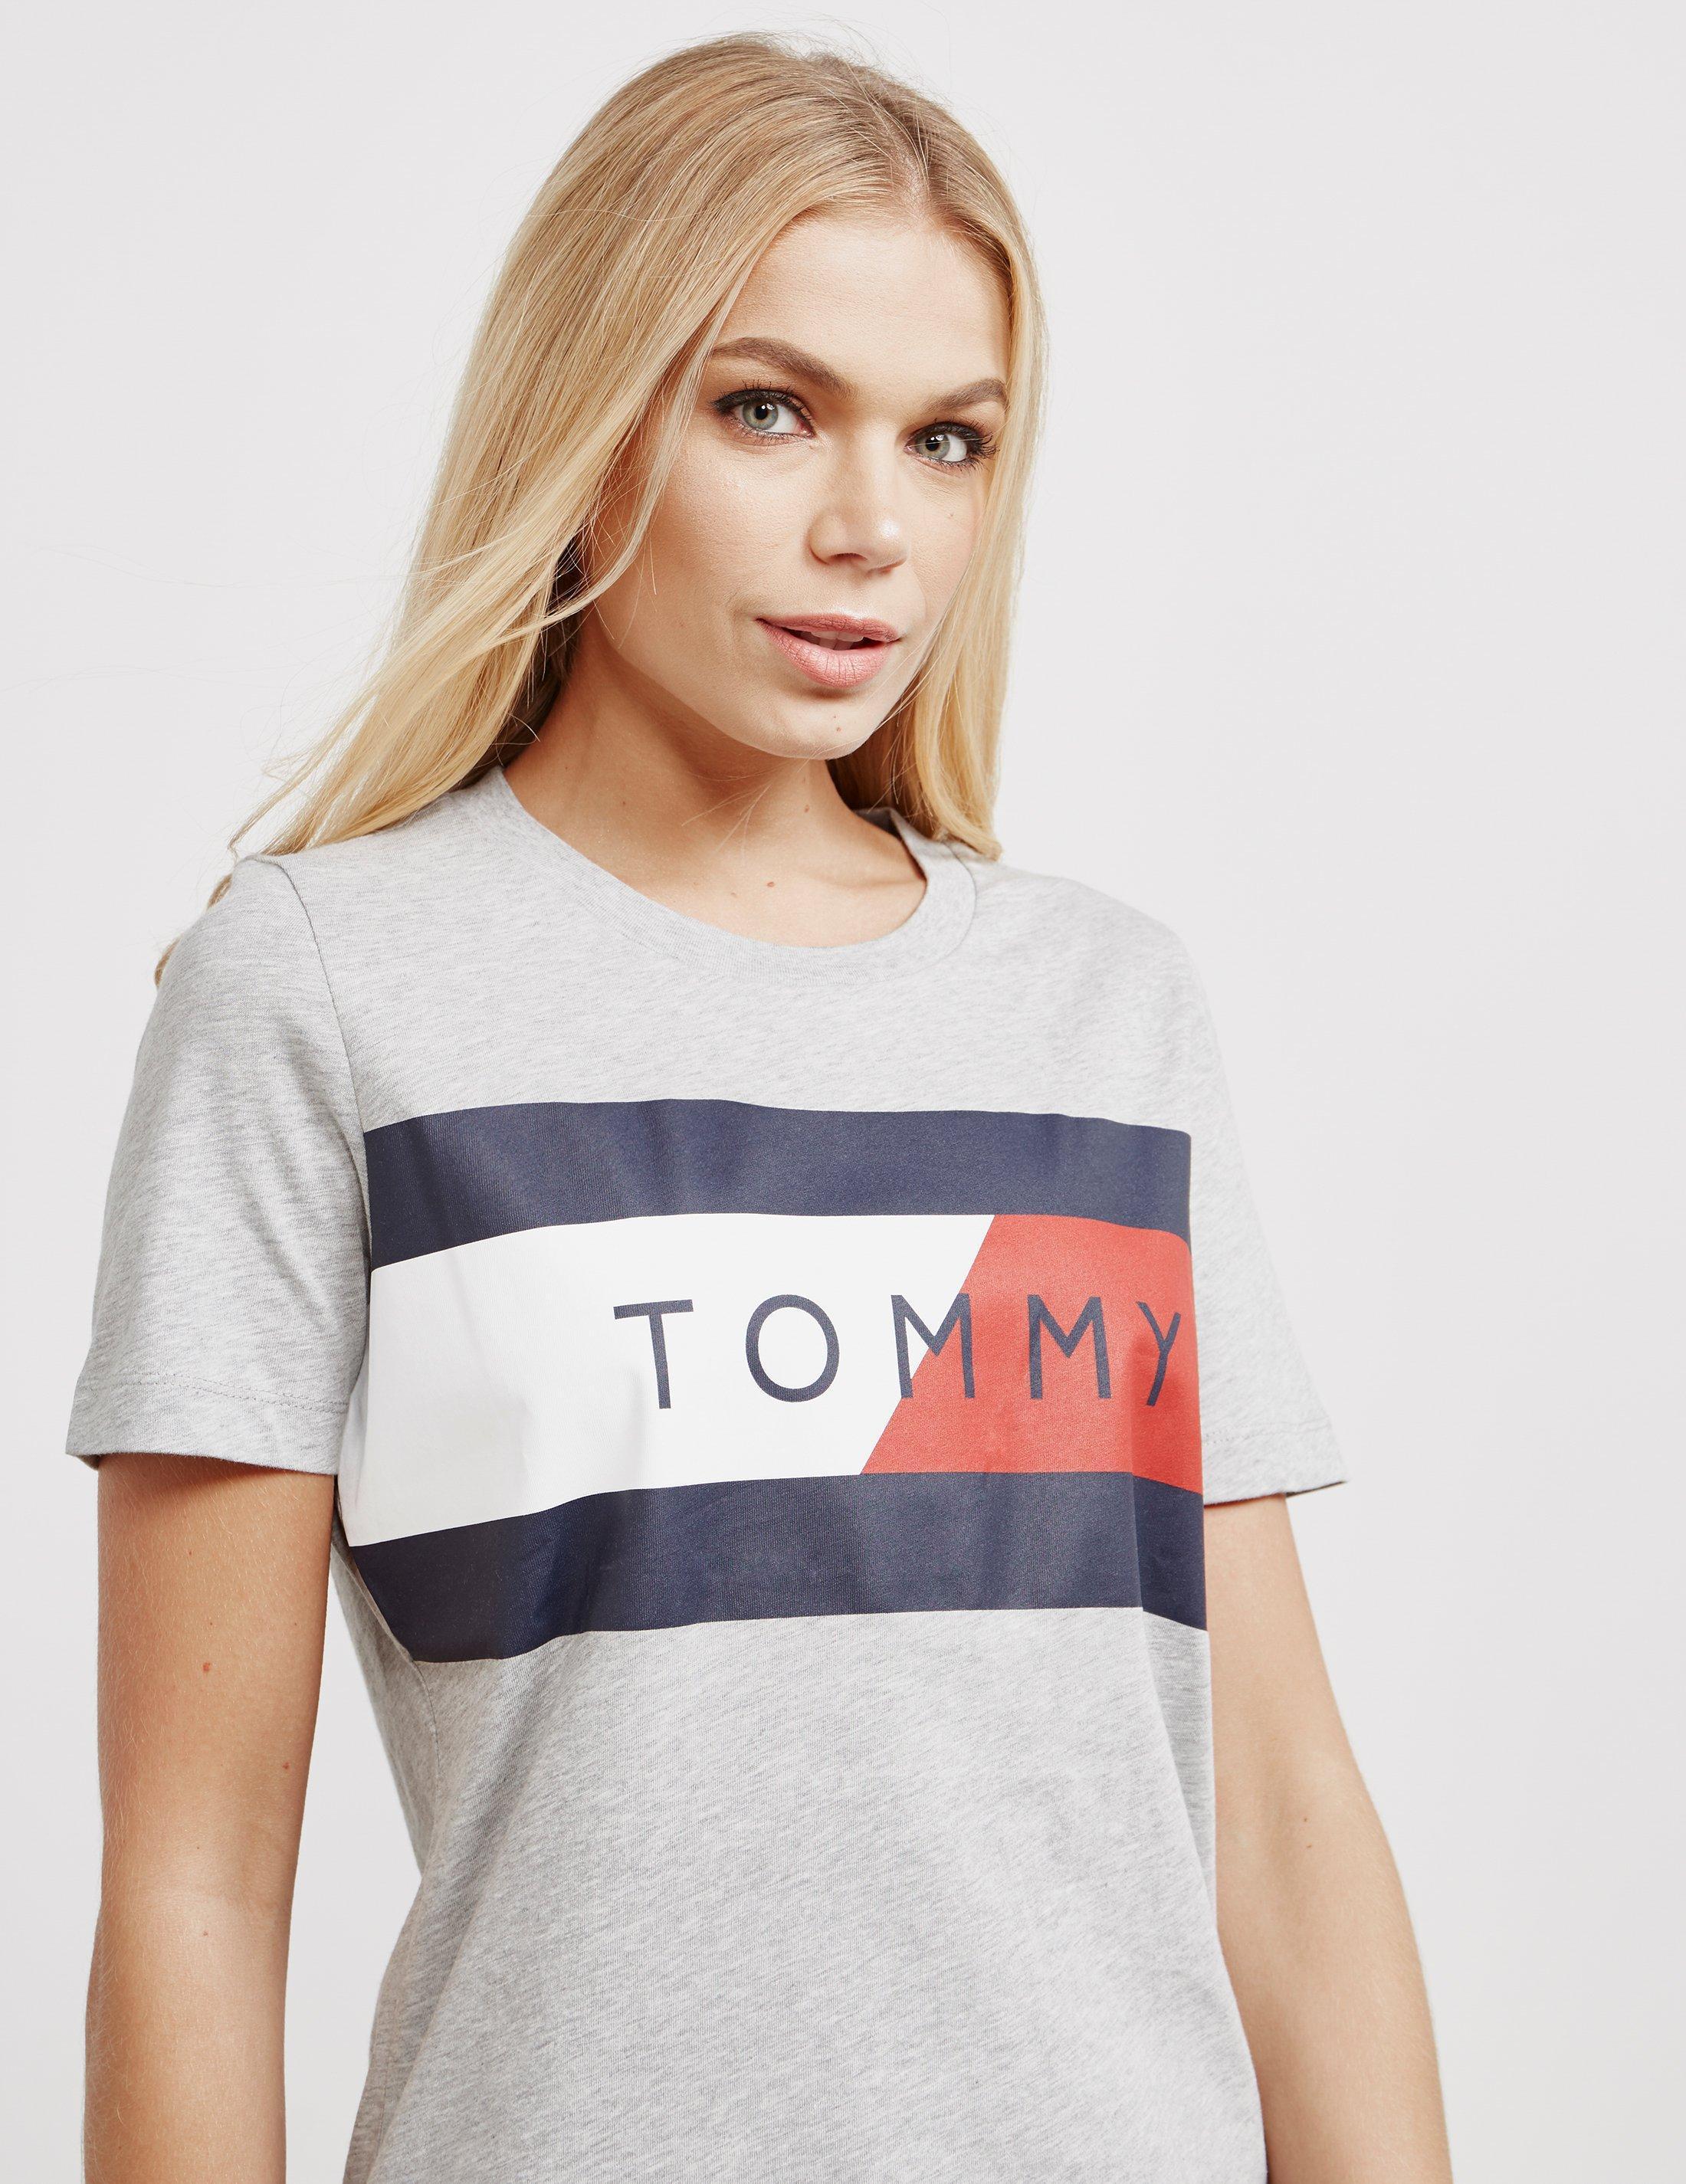 588434c1d Tommy Hilfiger Womens Athletic Logo Flag Short Sleeve T-shirt Grey ...